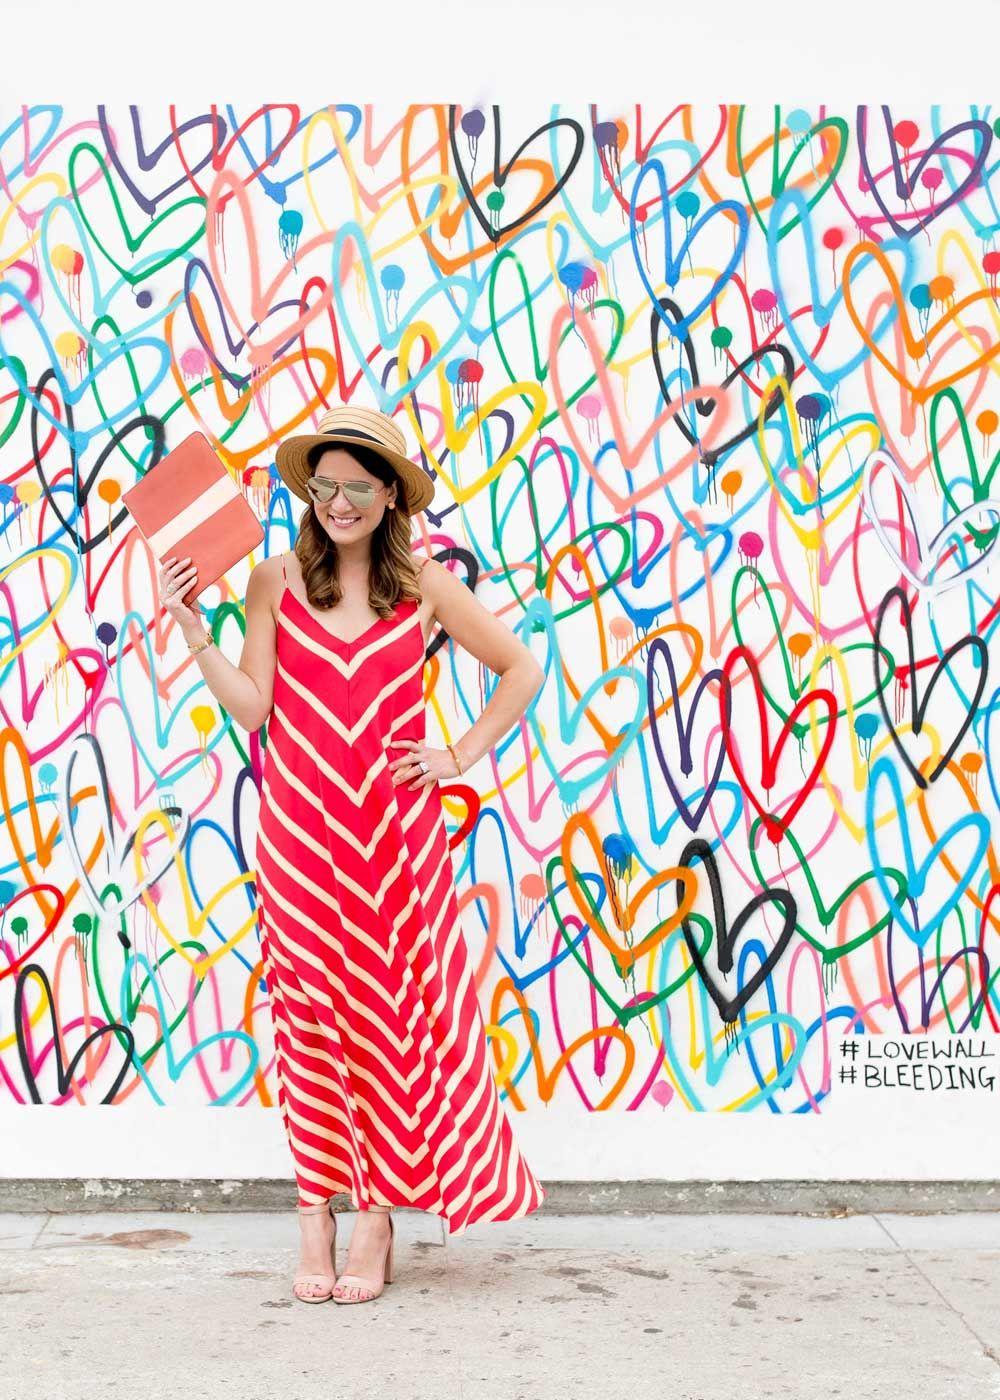 Multicolor bleeding hearts love wall by james goldcrown via jennifer lake wallcharades